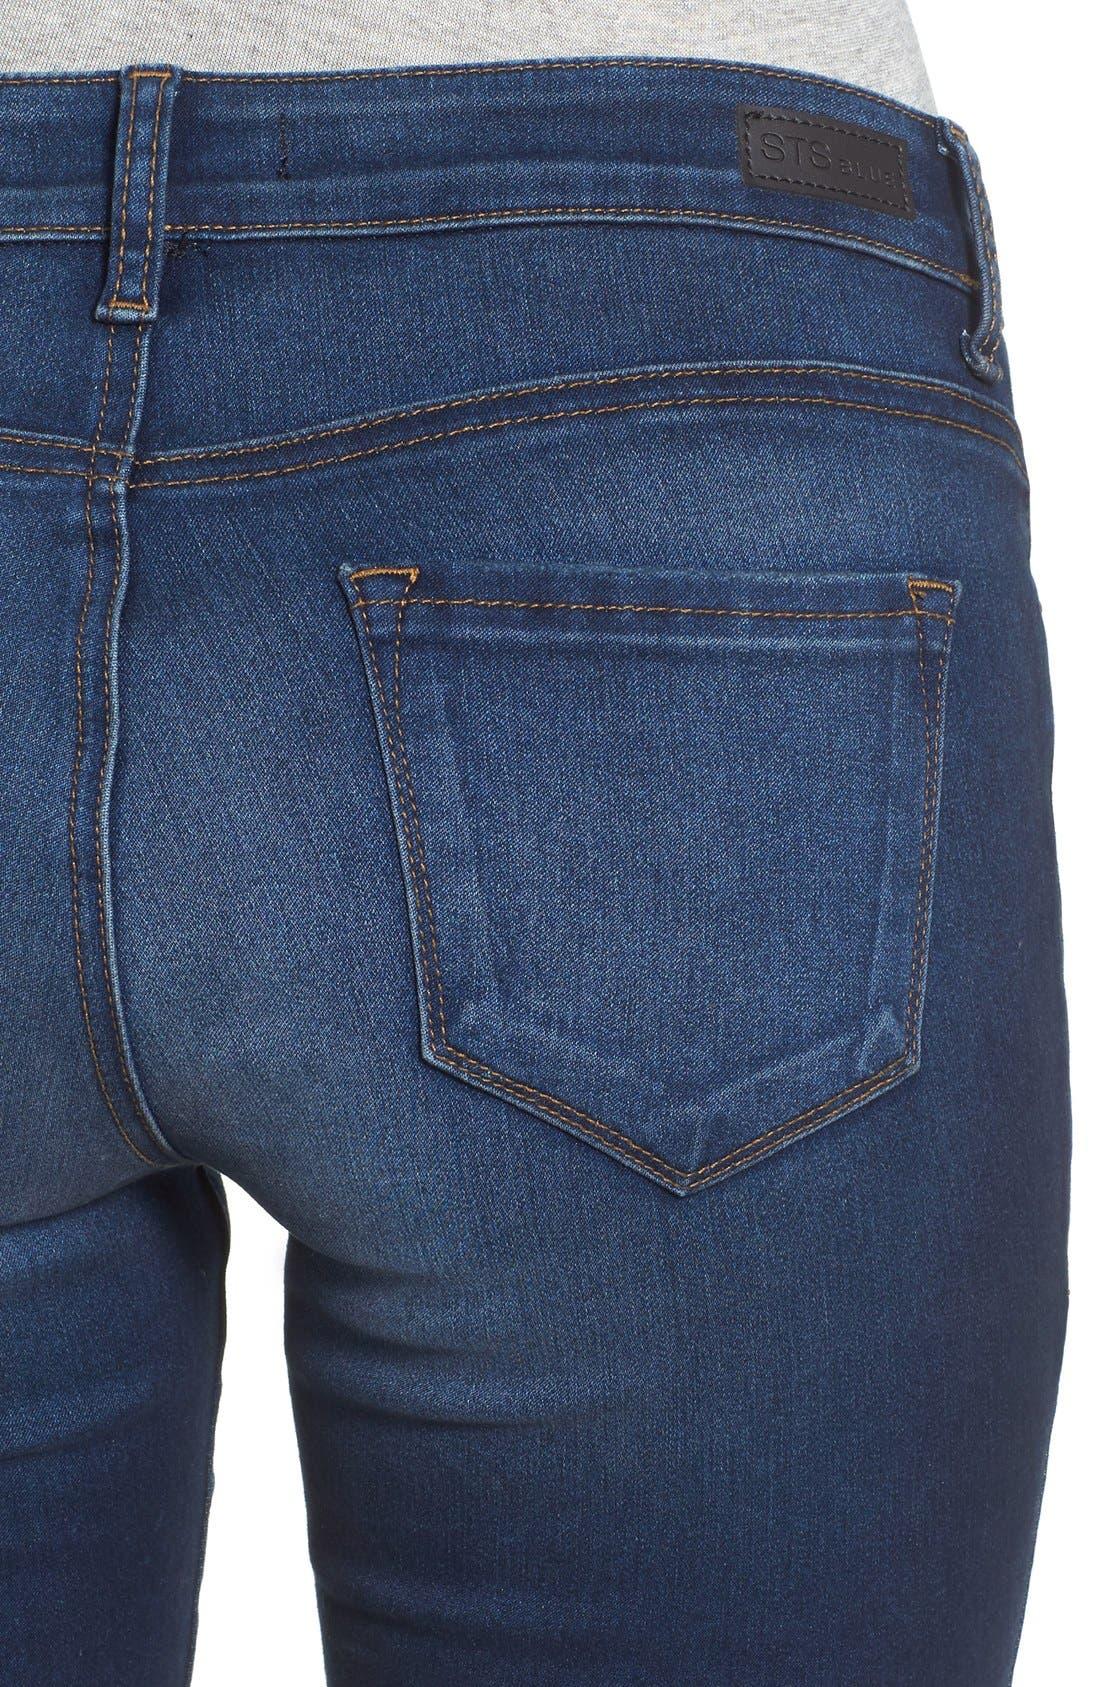 'Piper' Skinny Jeans,                             Alternate thumbnail 6, color,                             Royal Beach